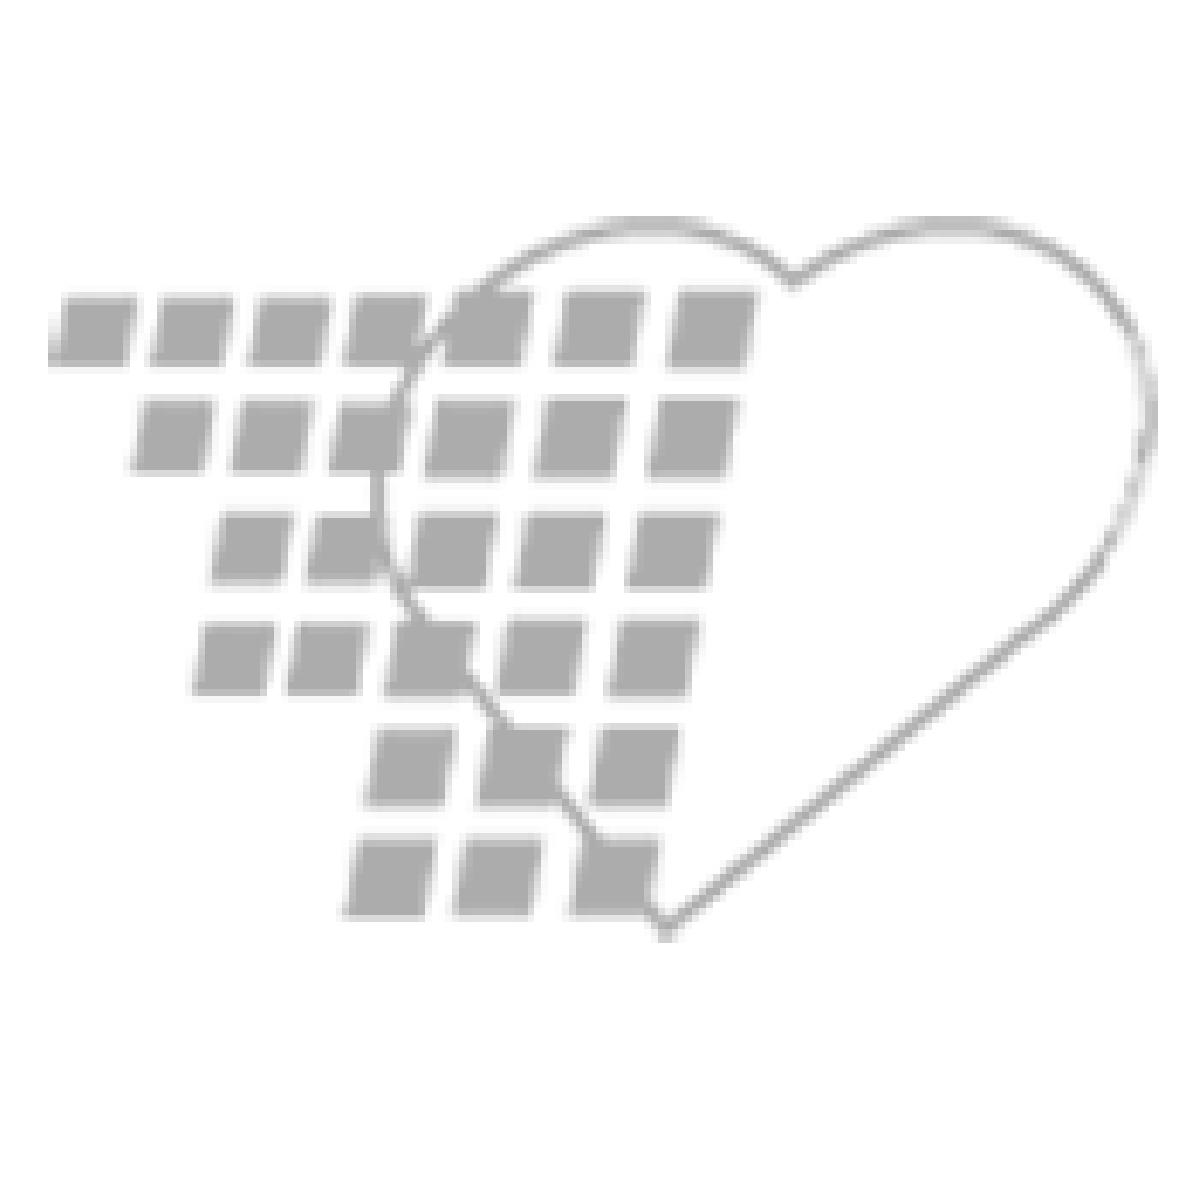 02-99-4501 - ADC® Replacement Laryngoscope Lamp